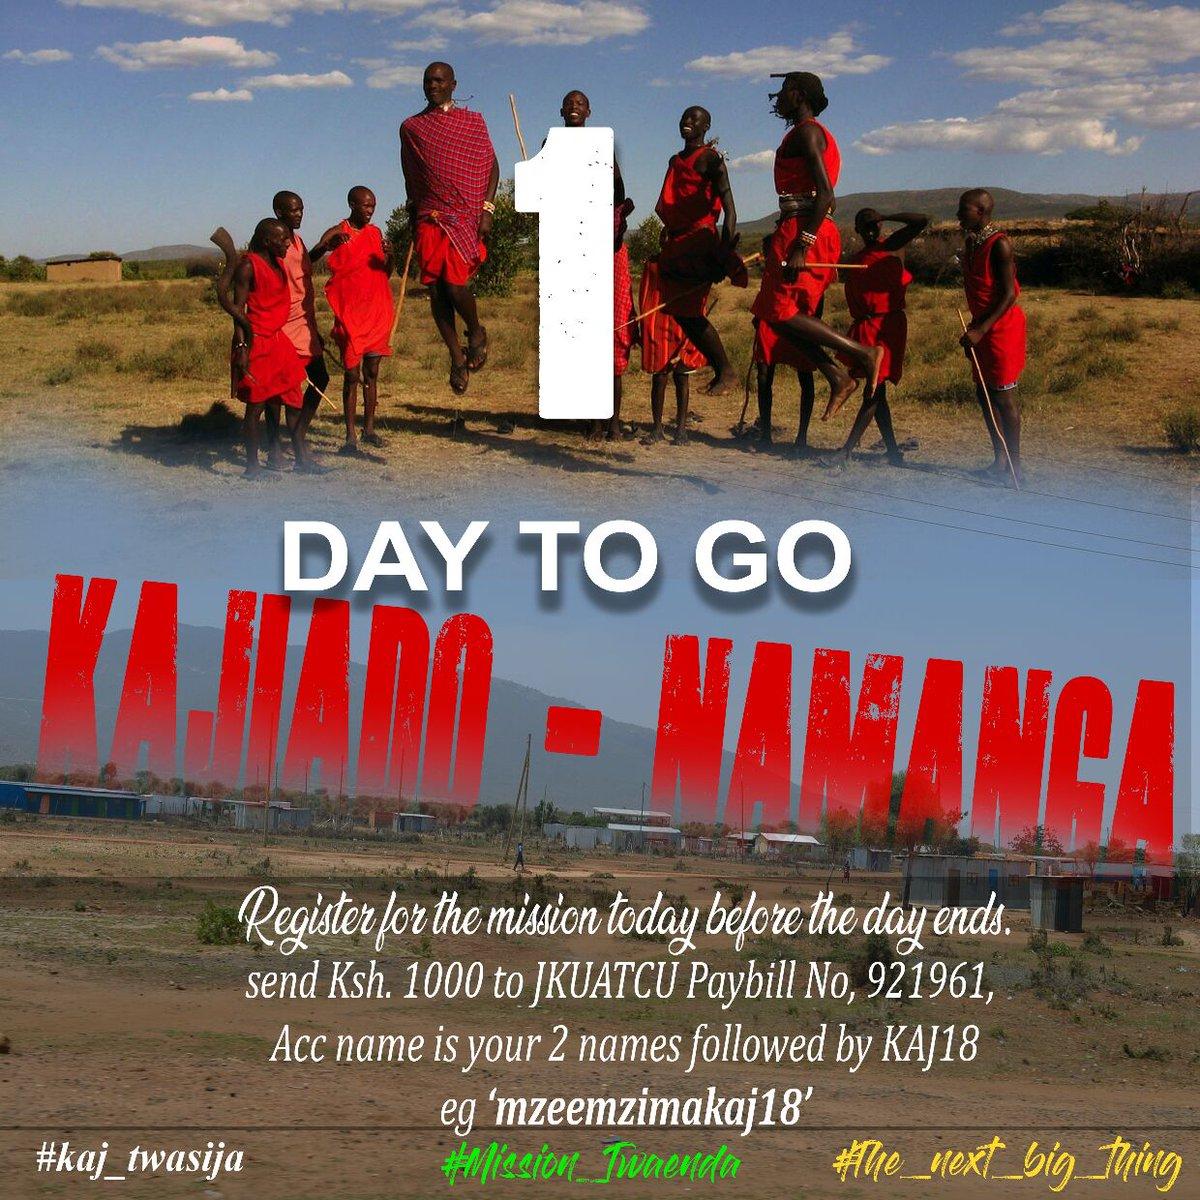 test Twitter Media - Kajiado Namanga Mission Registration. Please register using the CU playbill number that's 921961 and the account name as your two names and the word KAJ18. E.g. MzeeMzimaKAJ18.   You can also support the mission using the same paybill number as the Lord enables you  #KAJ_TWASIJA https://t.co/5gJiahj8hR